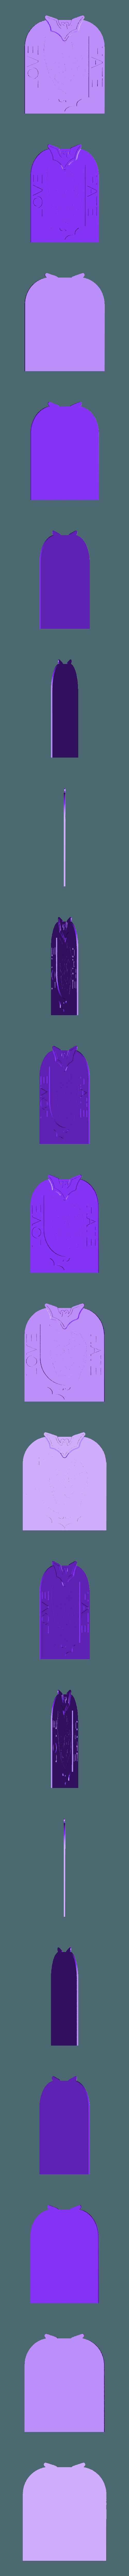 Body1.stl Télécharger fichier STL gratuit joker - batman • Plan à imprimer en 3D, yb__magiic